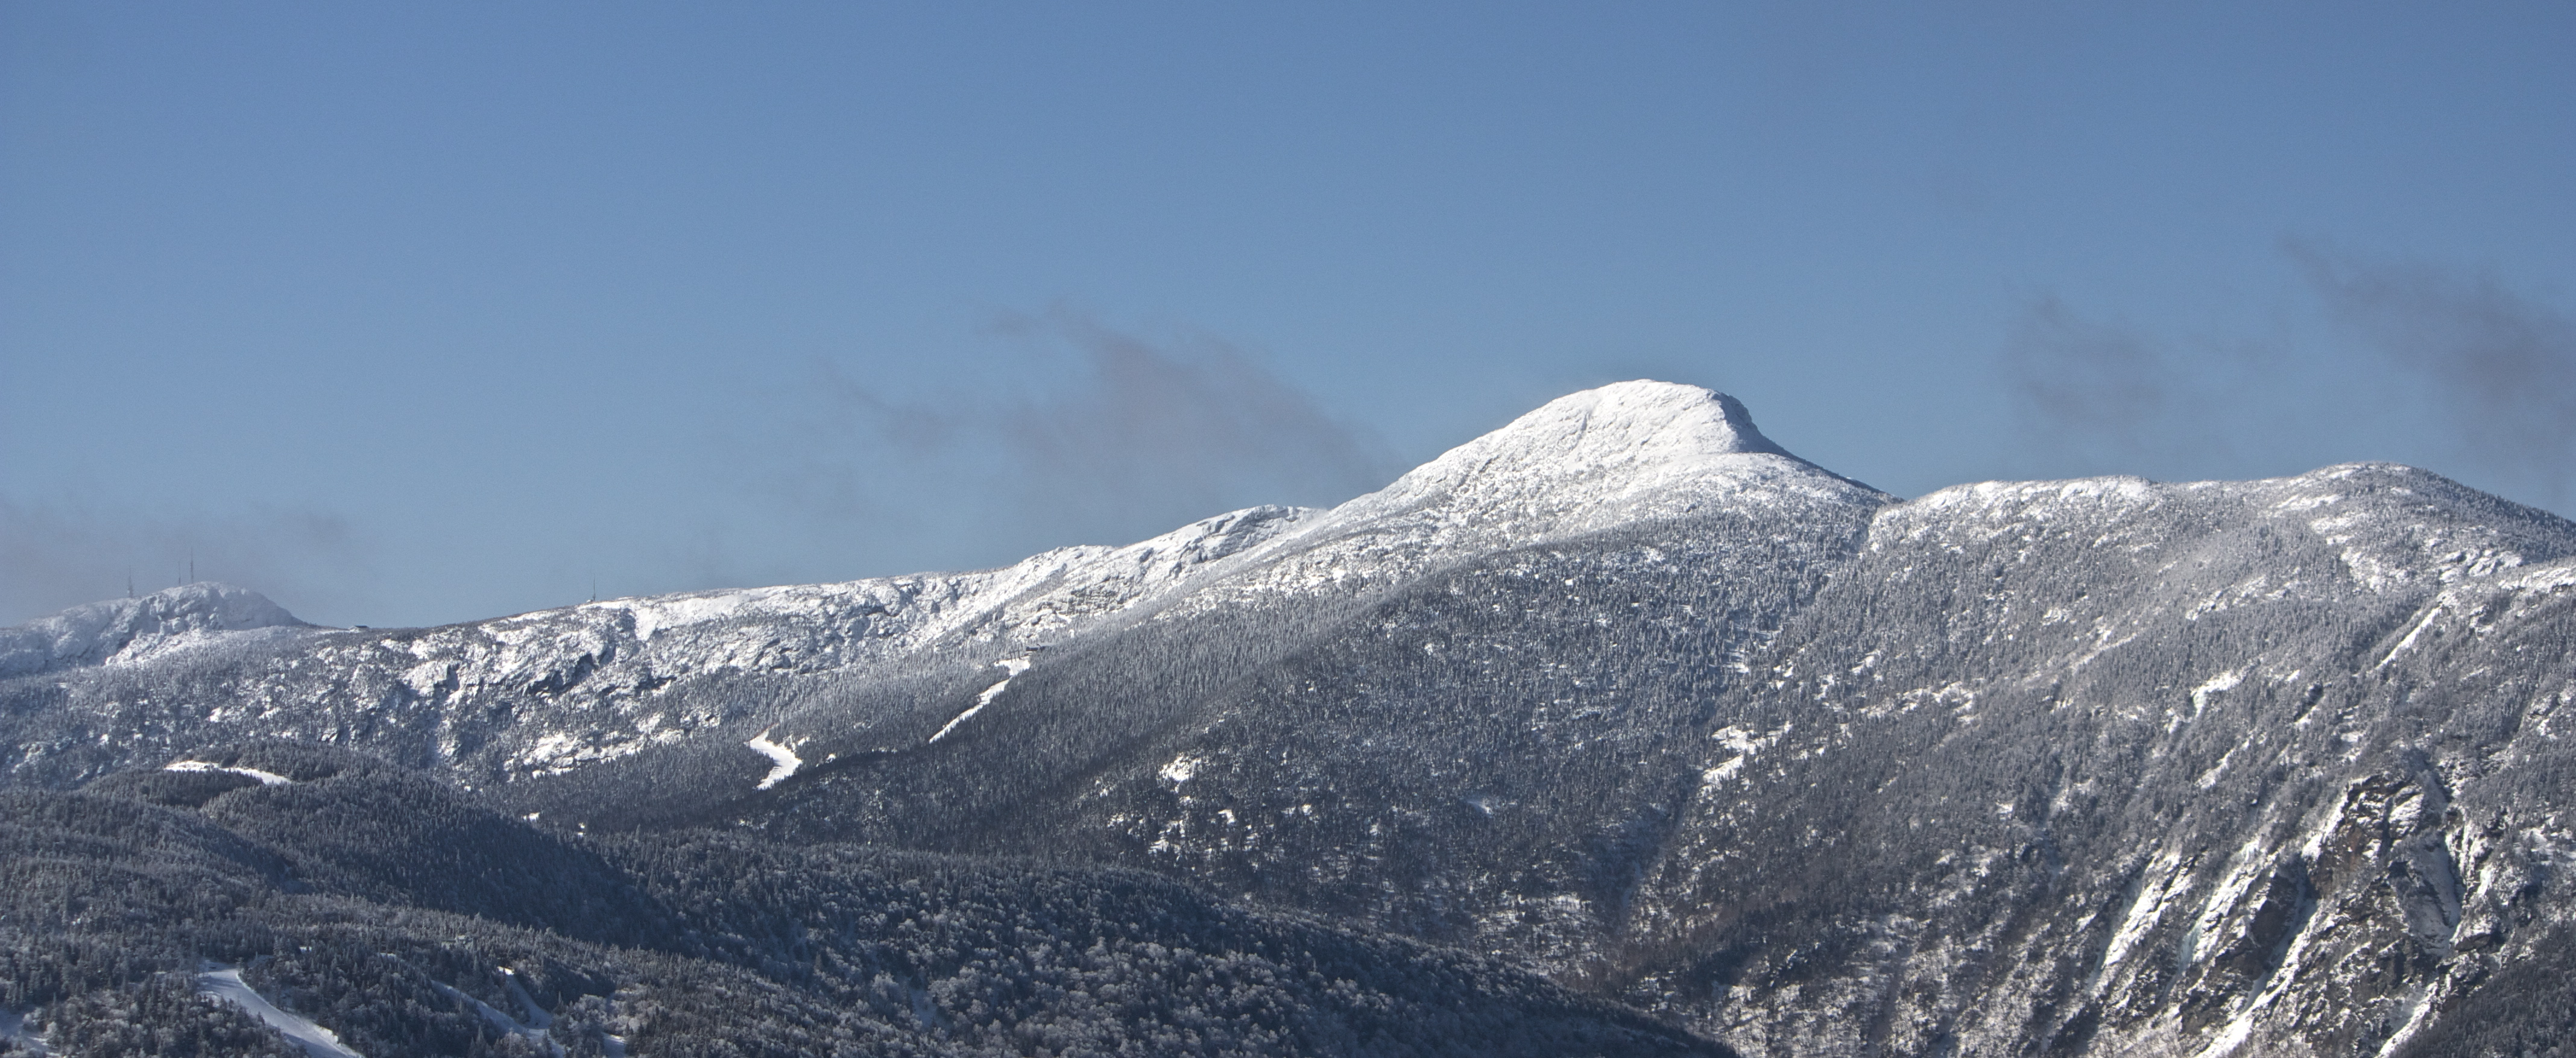 WhiteRoom Skis in Vermont